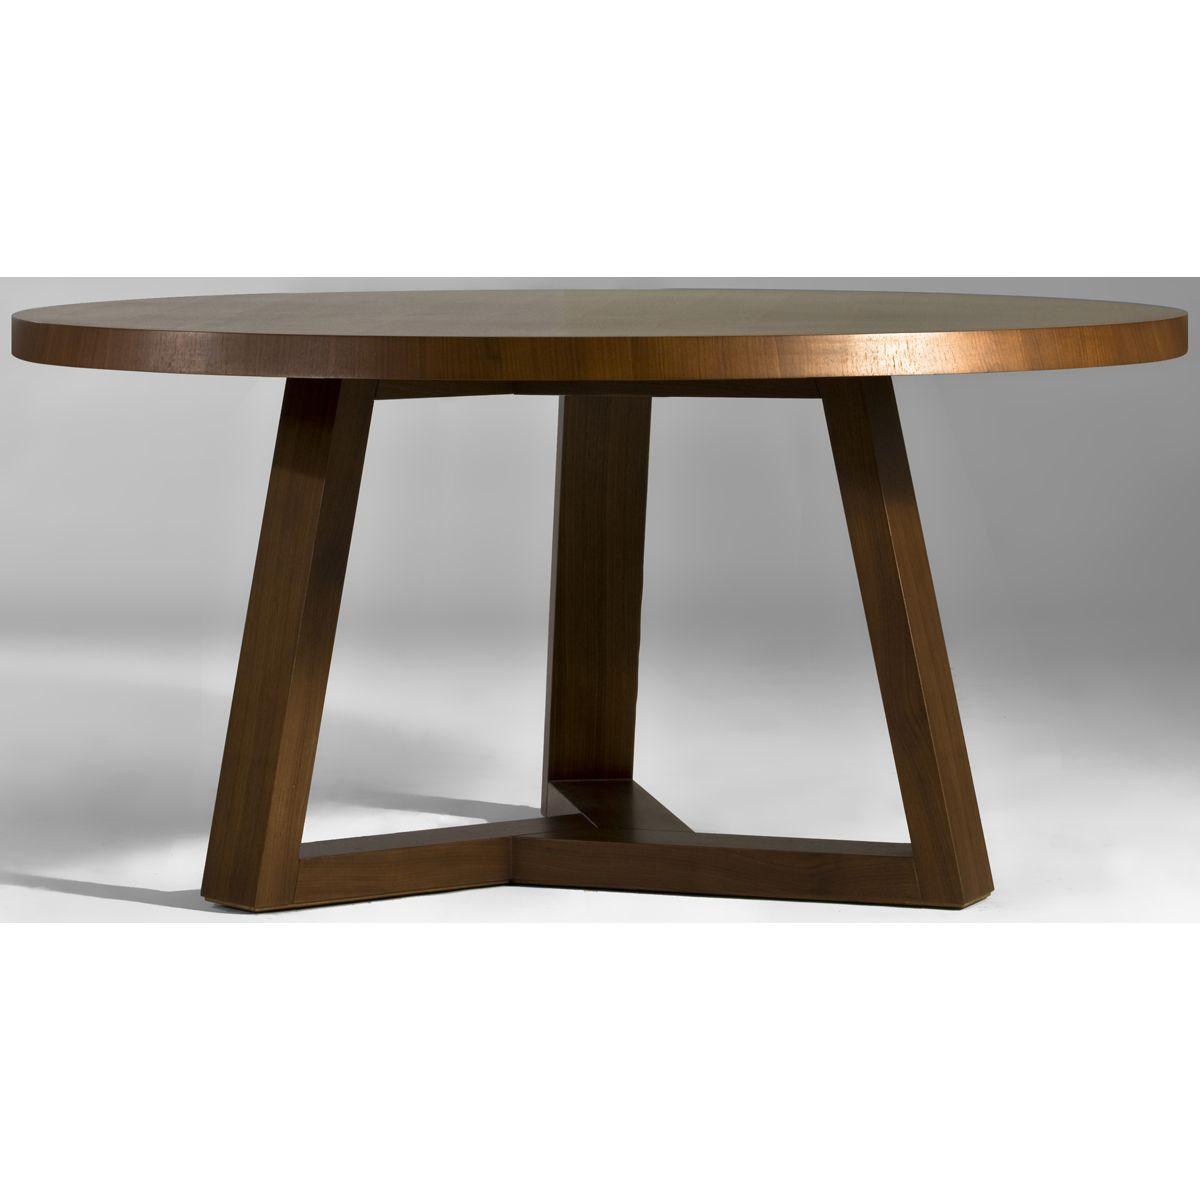 $1100 61' diameter Tripod Round Dining Table